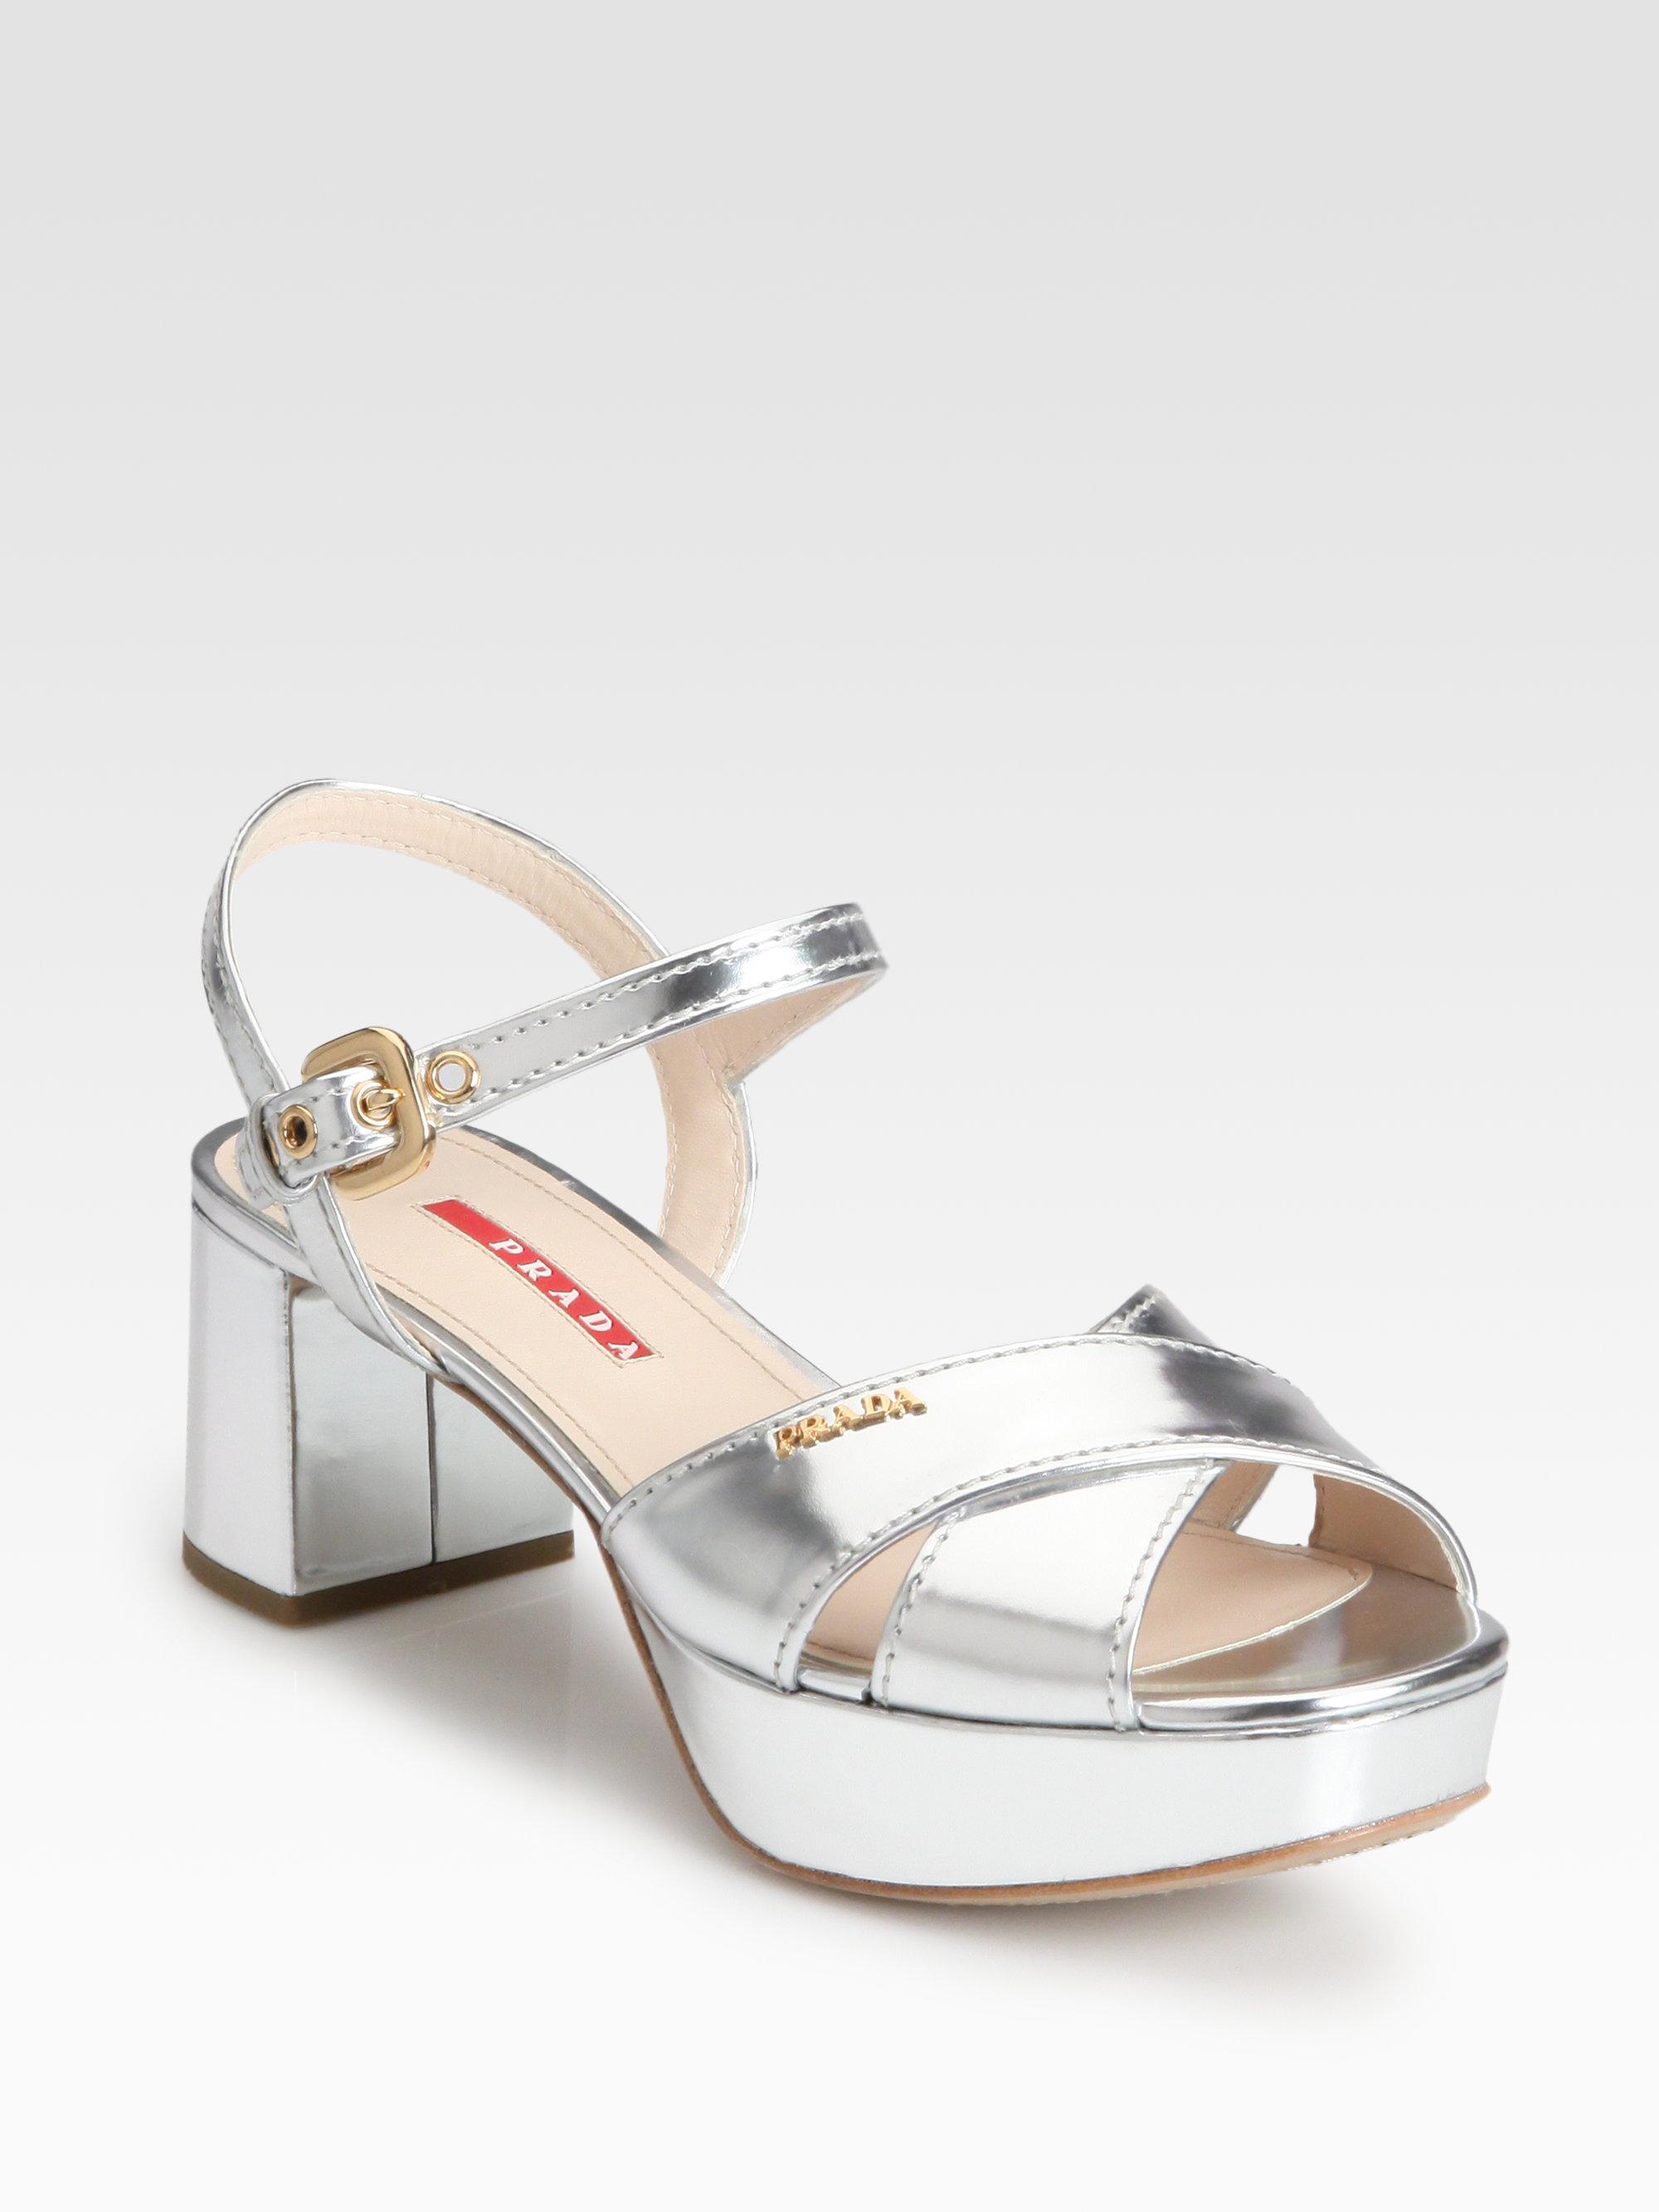 Prada Metallic Leather Crisscross Platform Sandals - Lyst